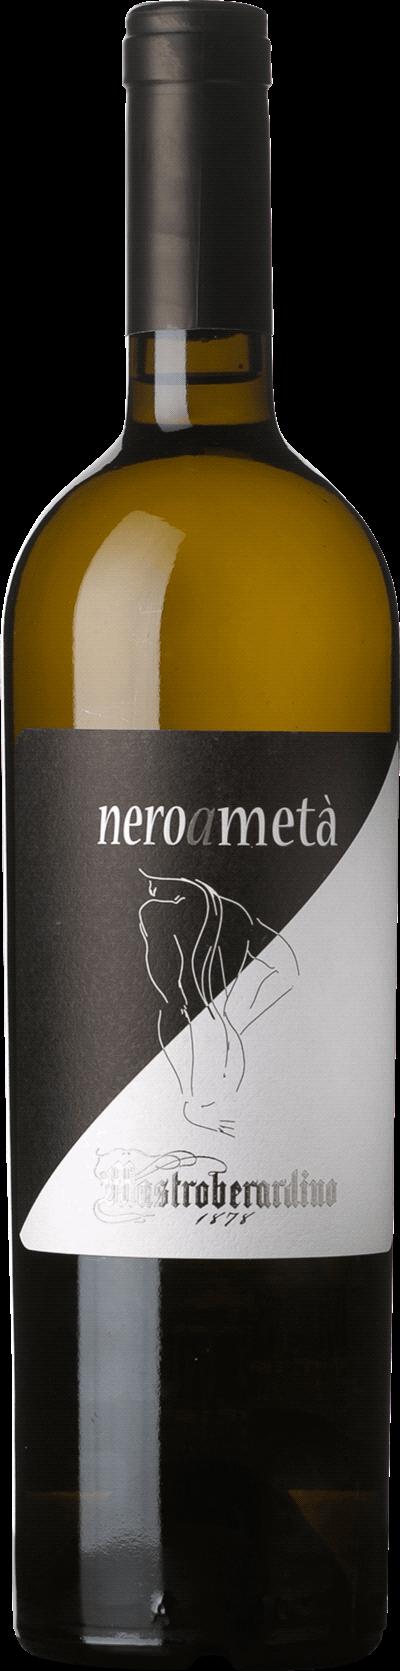 mastroberardino_wine-table